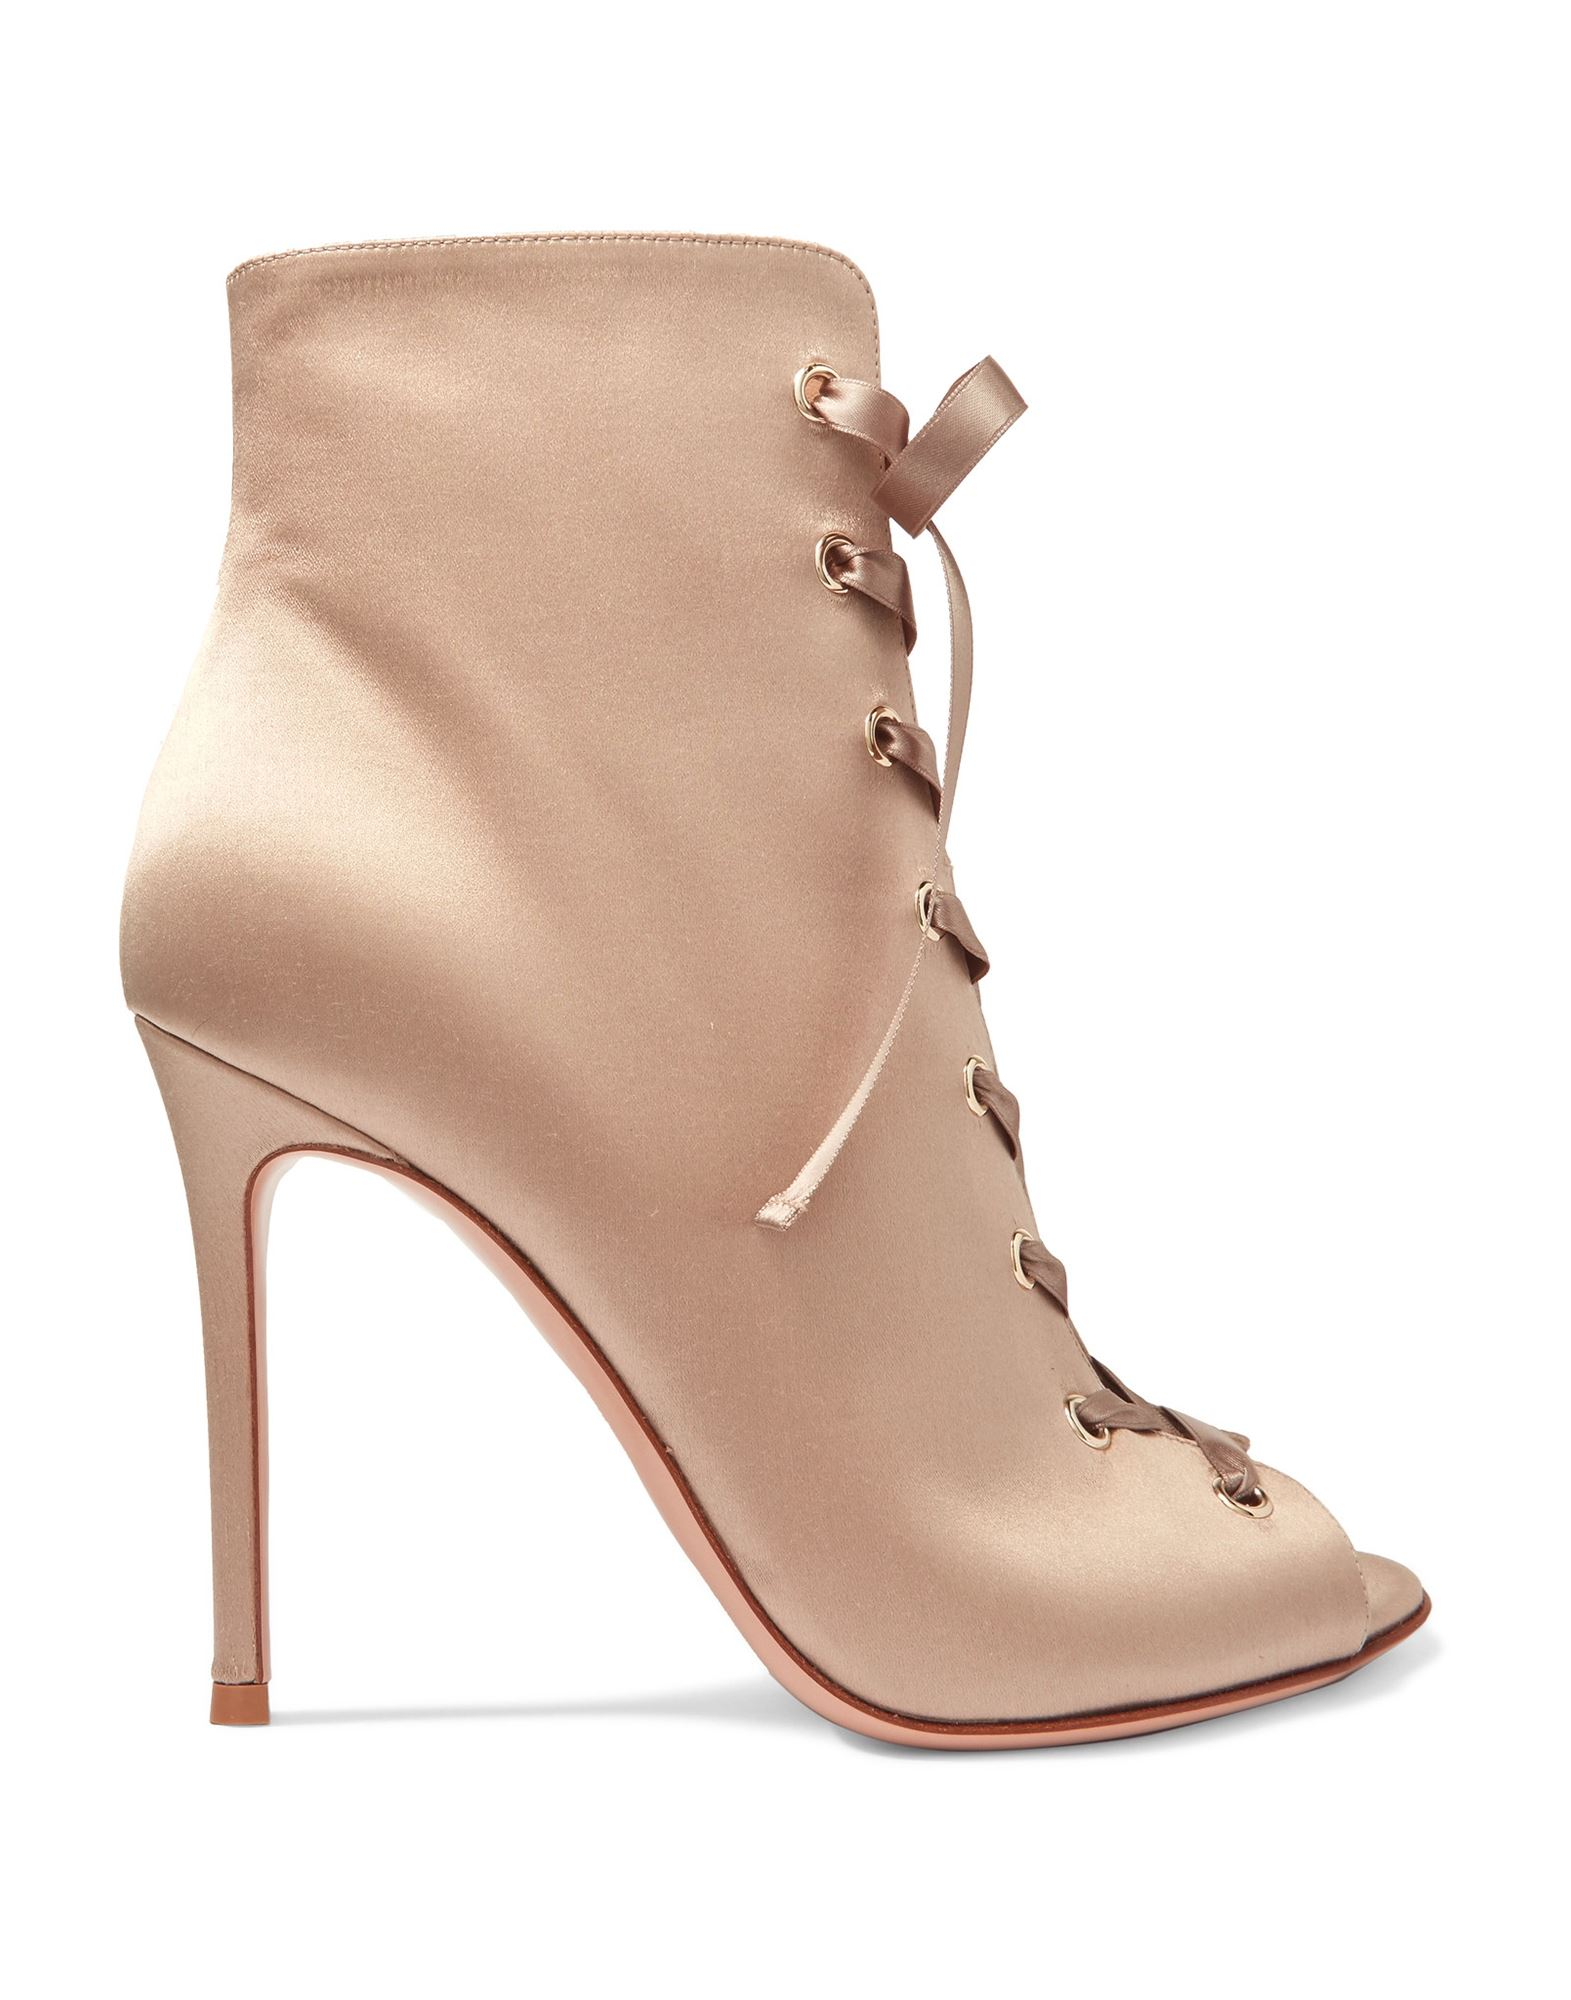 Bottine Gianvito Rossi Femme - Bottines Gianvito Rossi Beige Dernières chaussures discount pour hommes et femmes